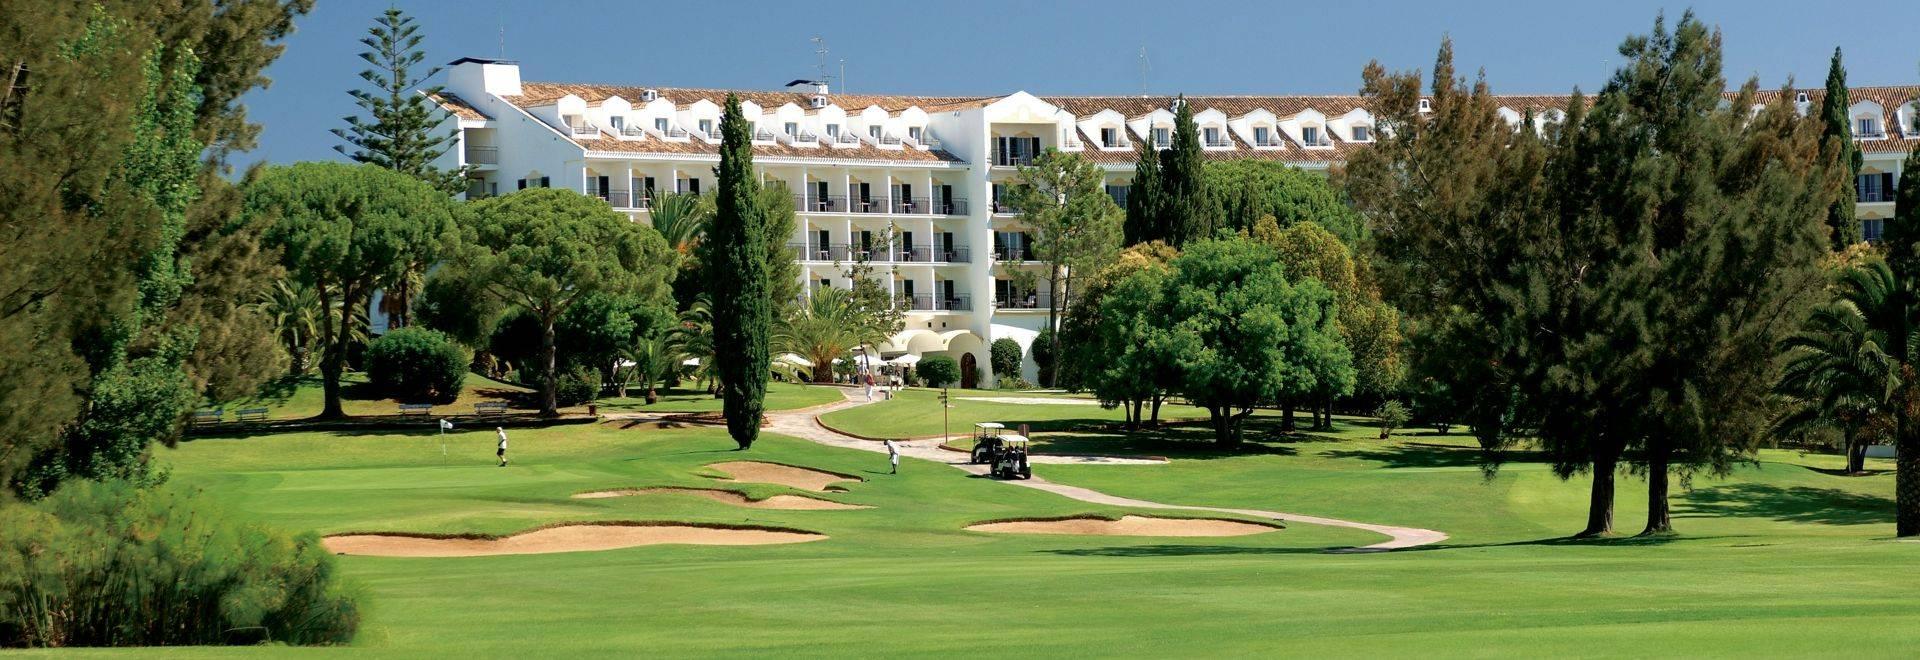 Penina Hotel & Golf Resort   Big Main